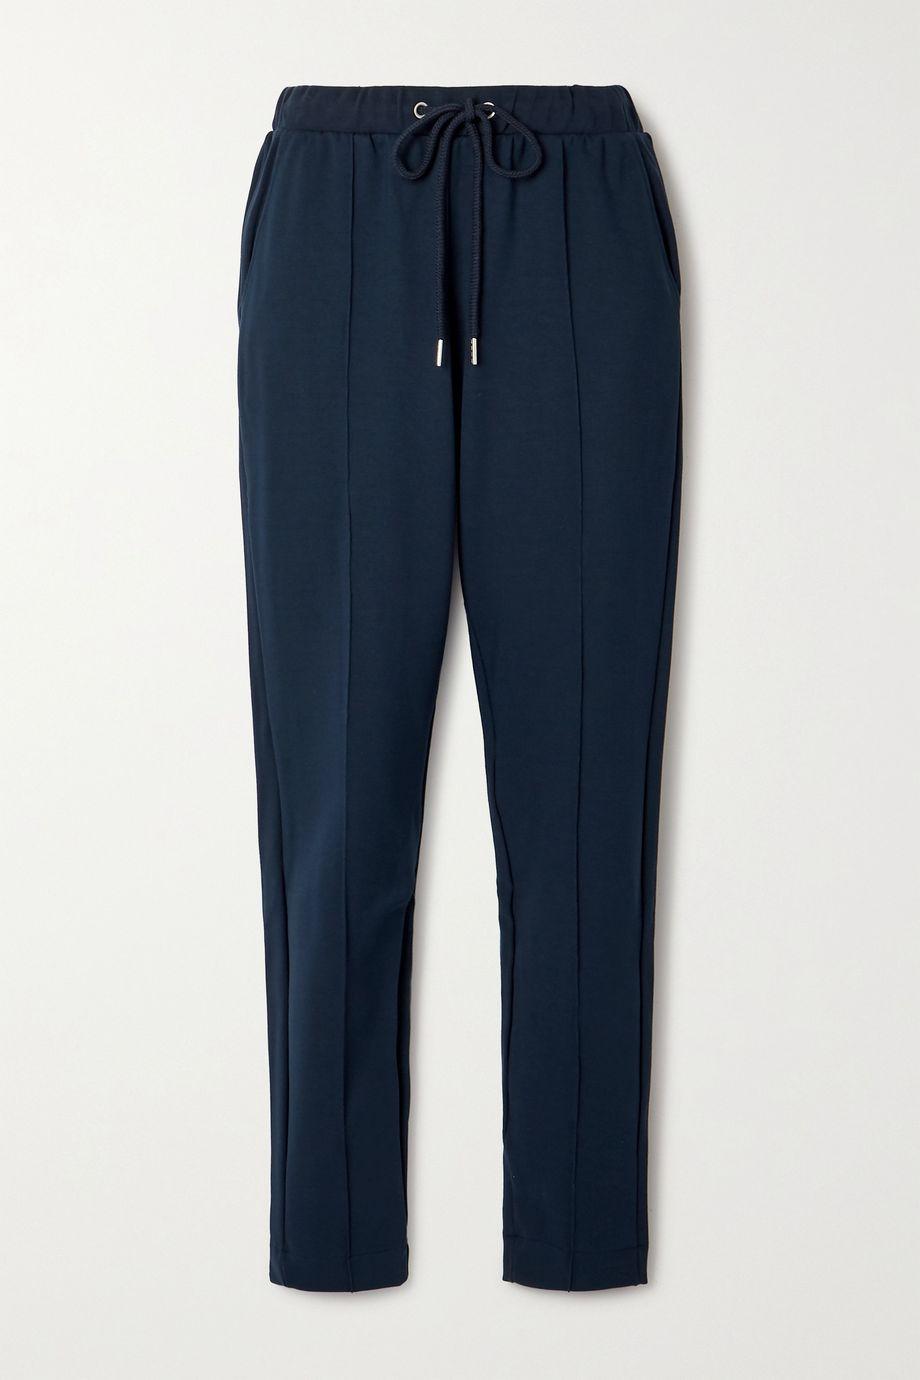 Hanro Pure Comfort piqué track pants